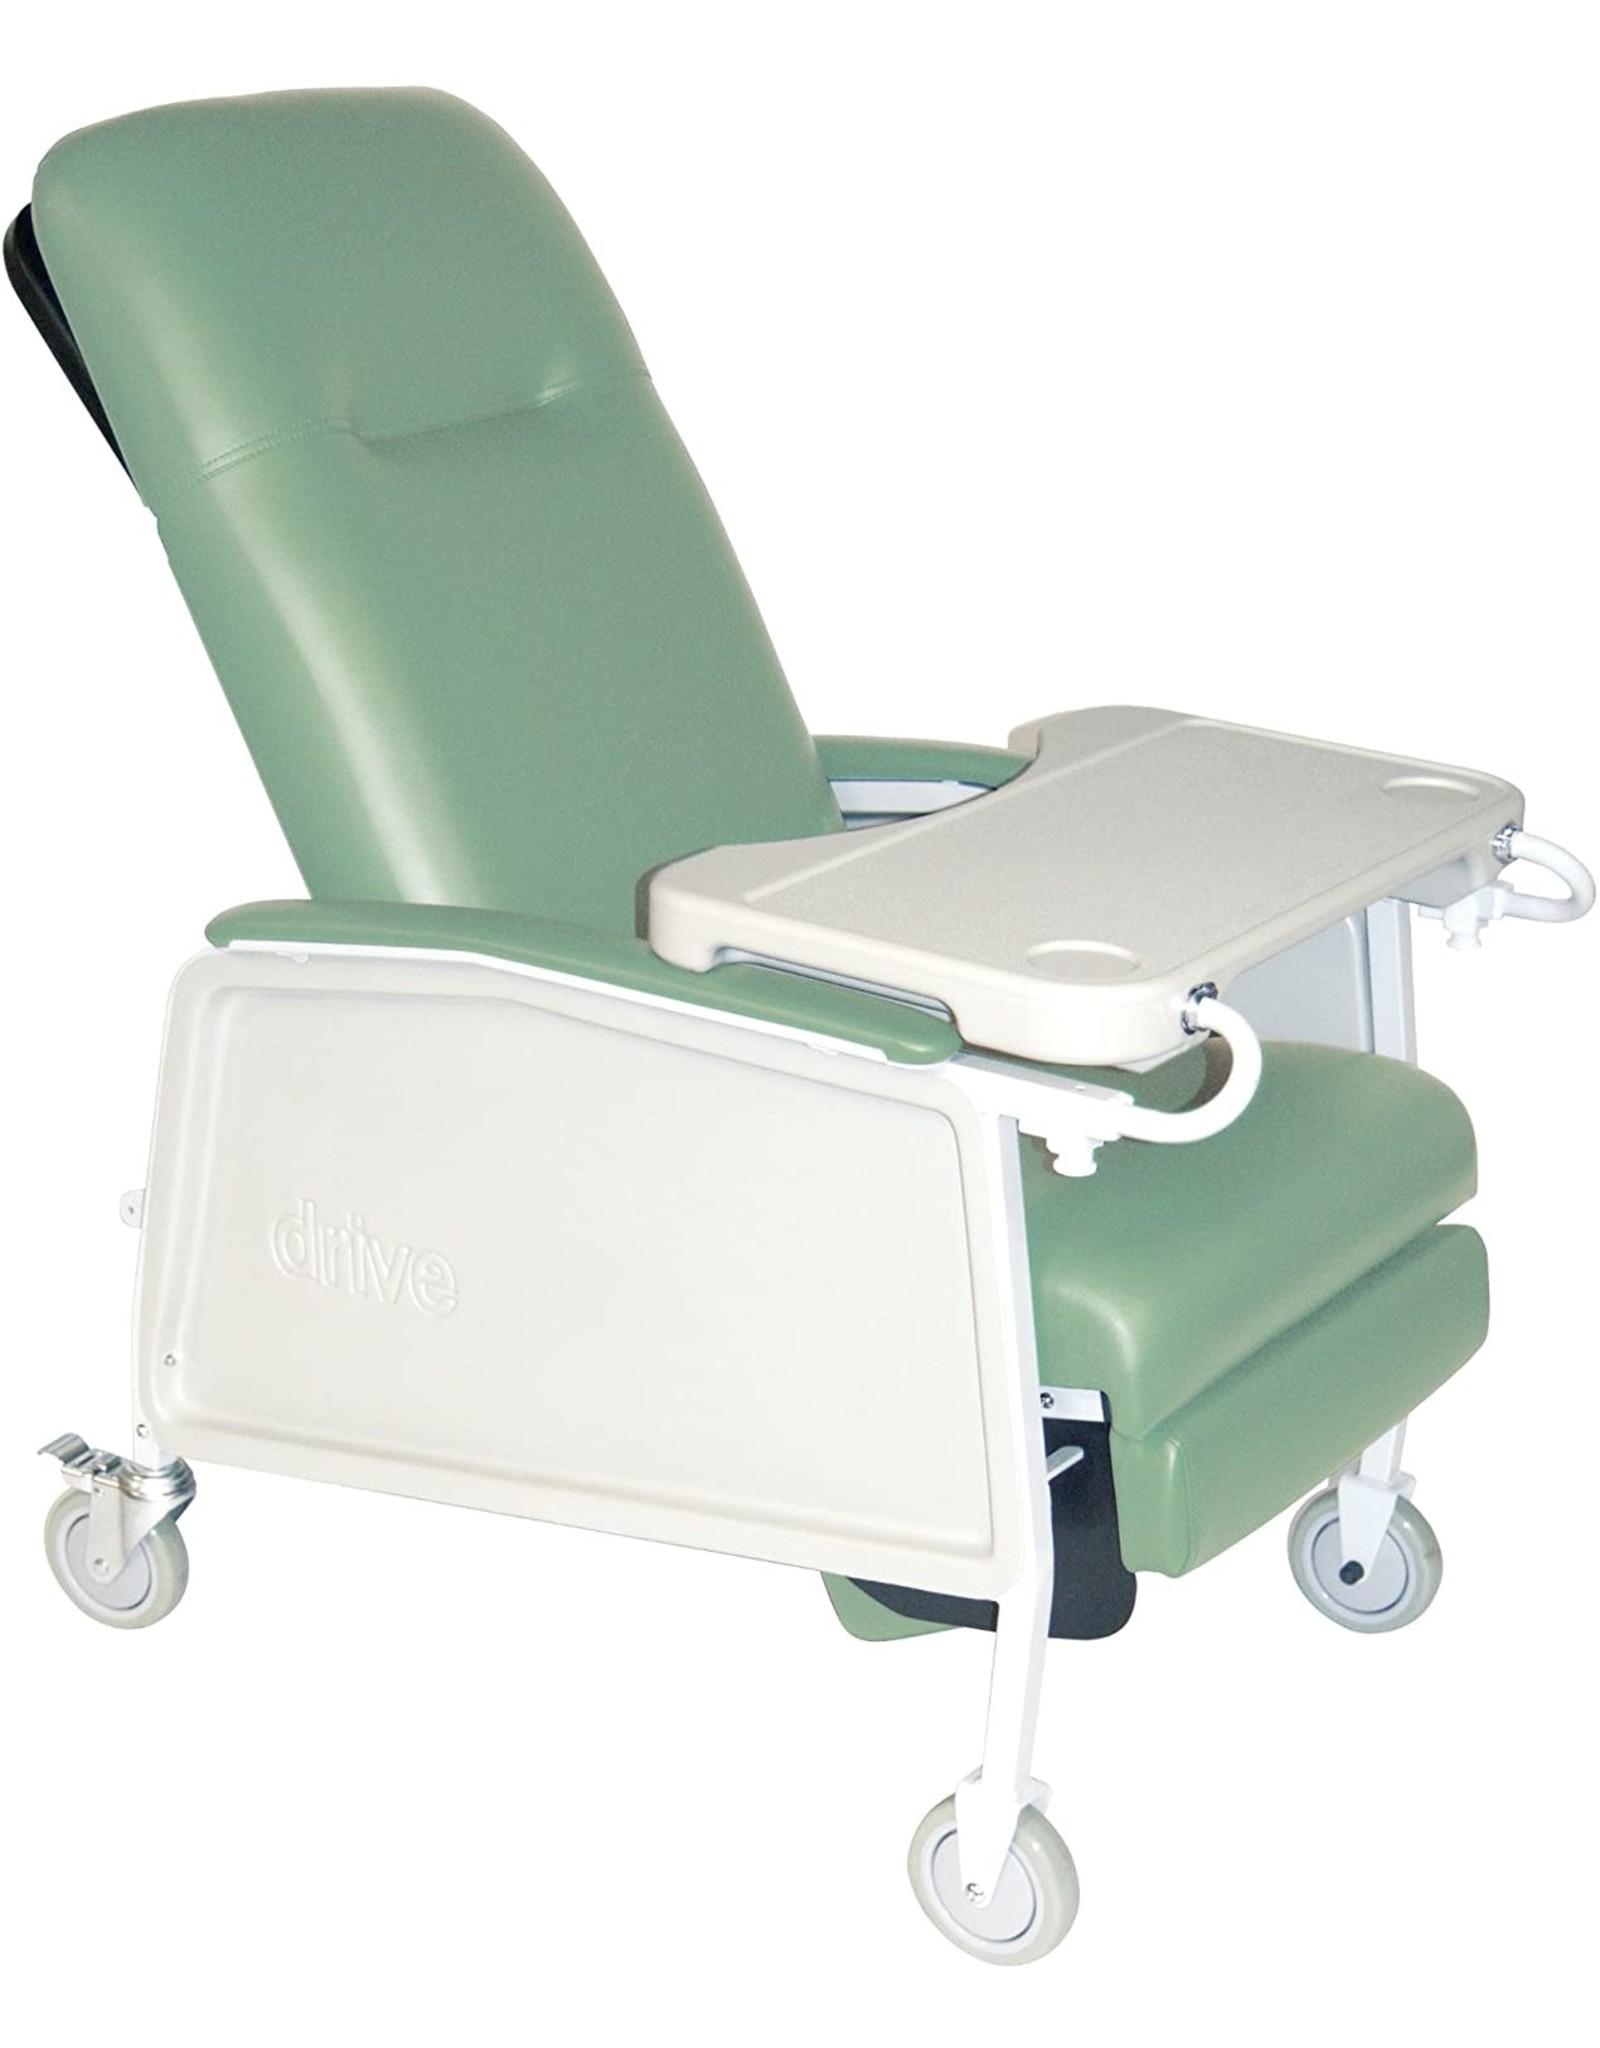 Drive Medical Drive Medical 3 Position Heavy Duty Bariatric Geri Chair Recliner, Jade